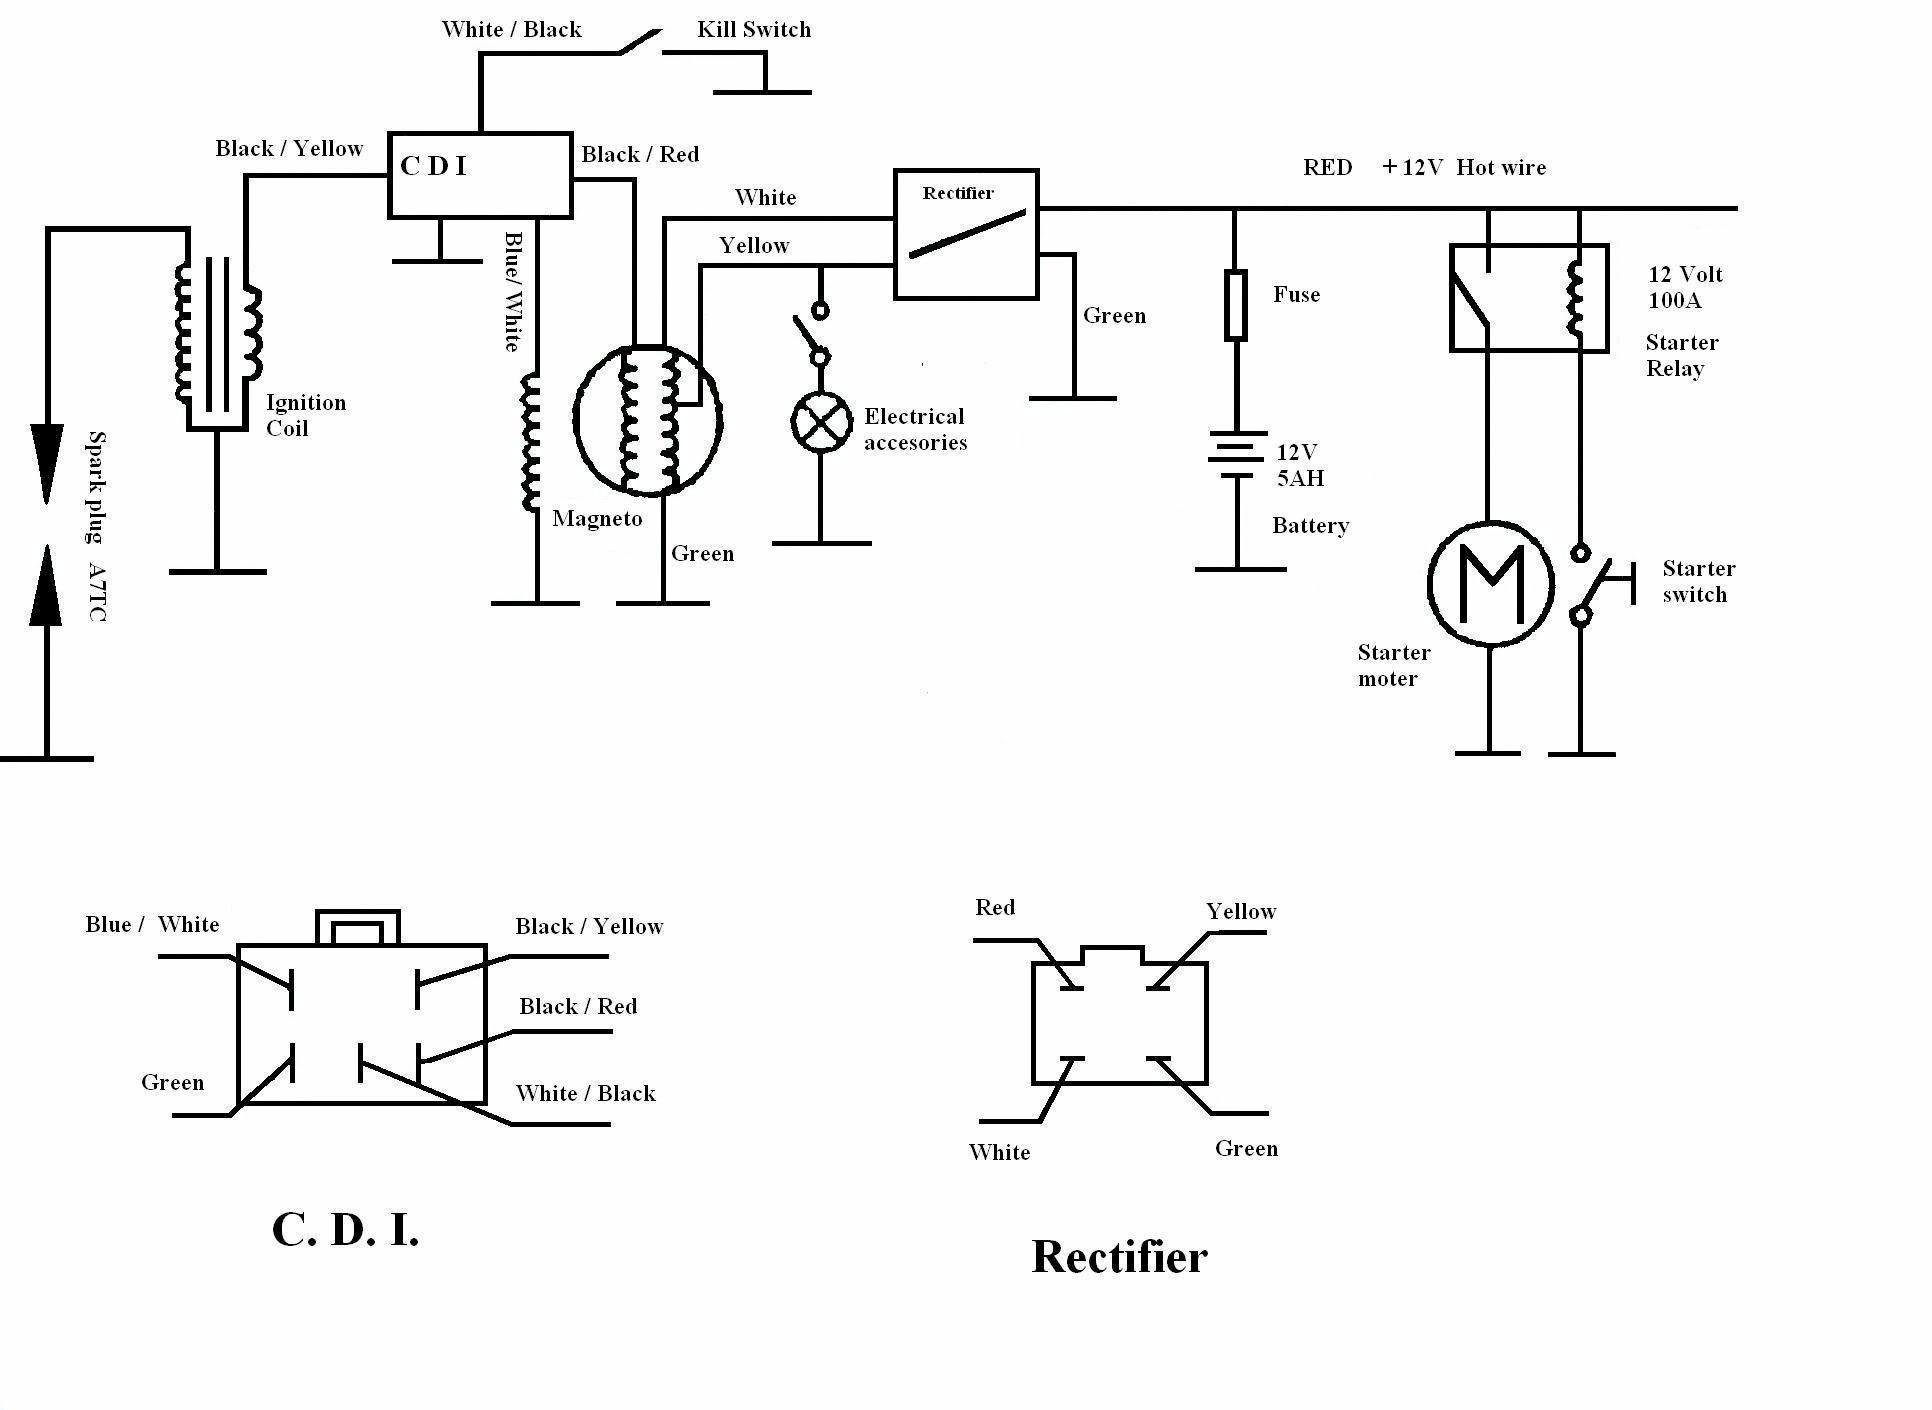 Lifan 125 Engine Wiring Diagram - Wiring Diagram